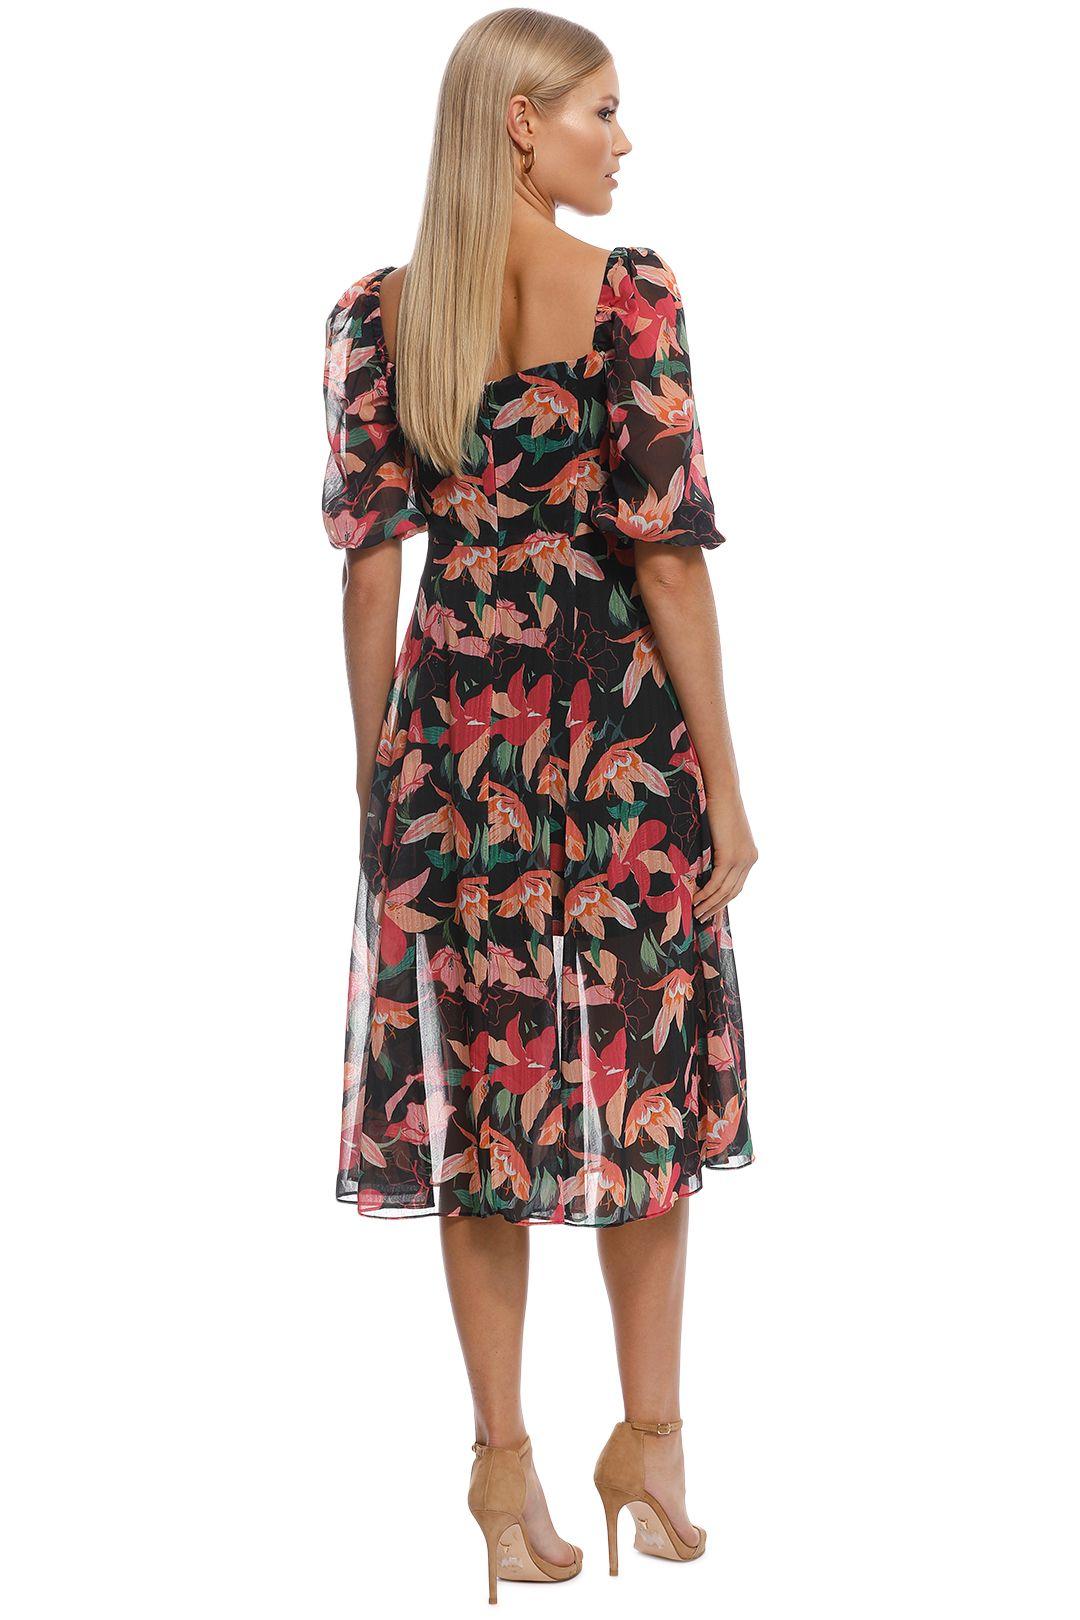 Talulah - Night Mirage Midi Dress - Black Floral - Back